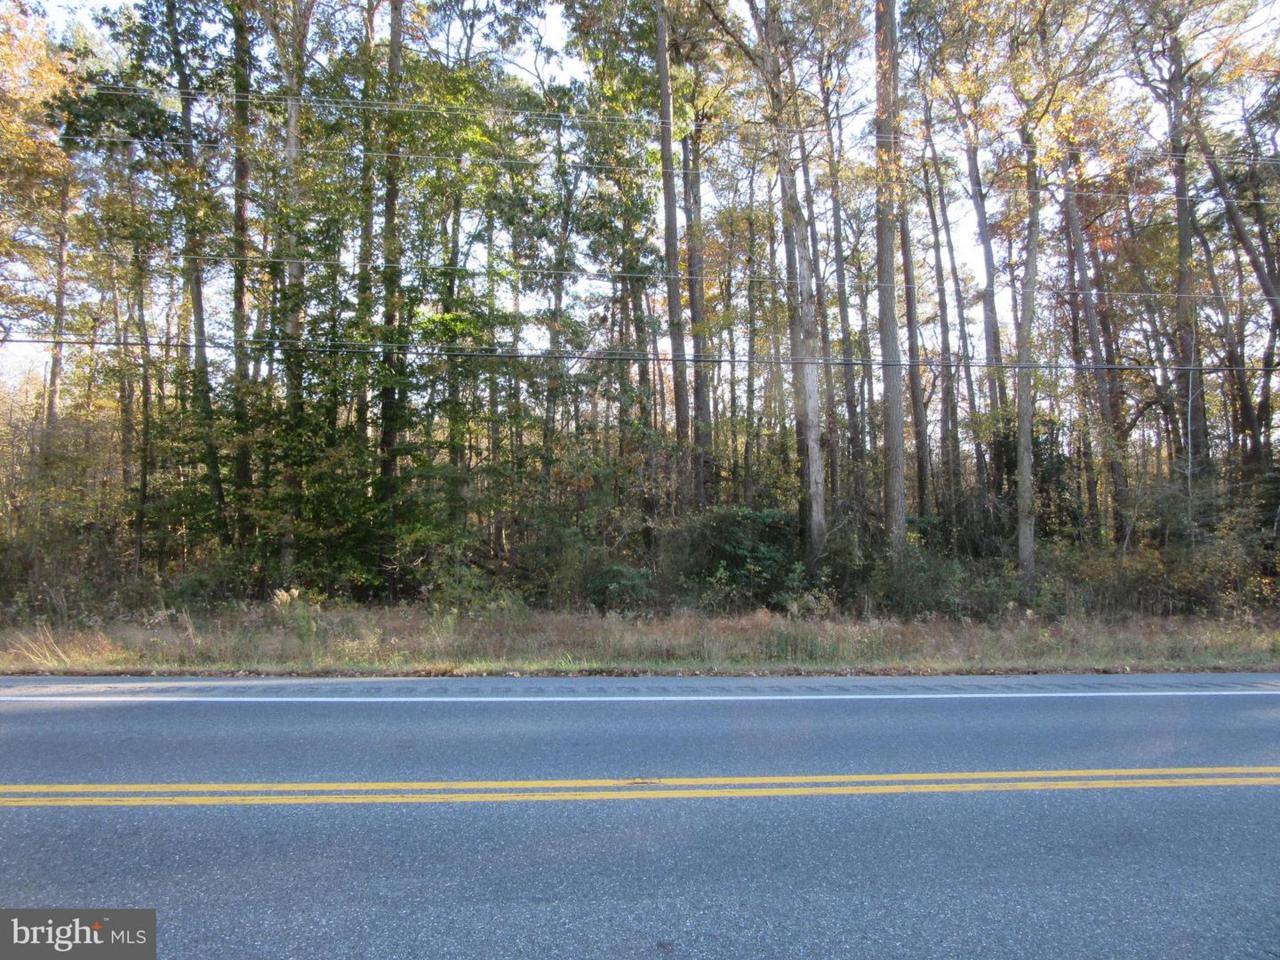 LOT 205 Deal Island Road - Photo 1